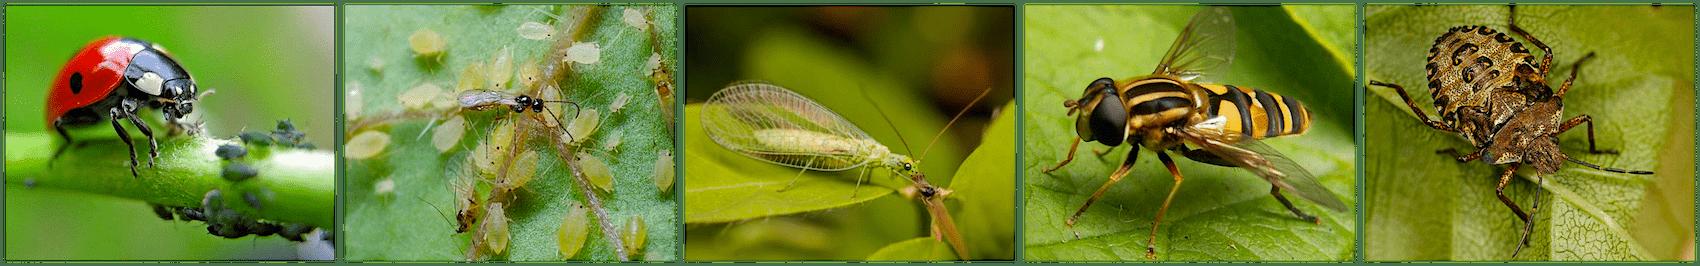 Insectes et pucerons.